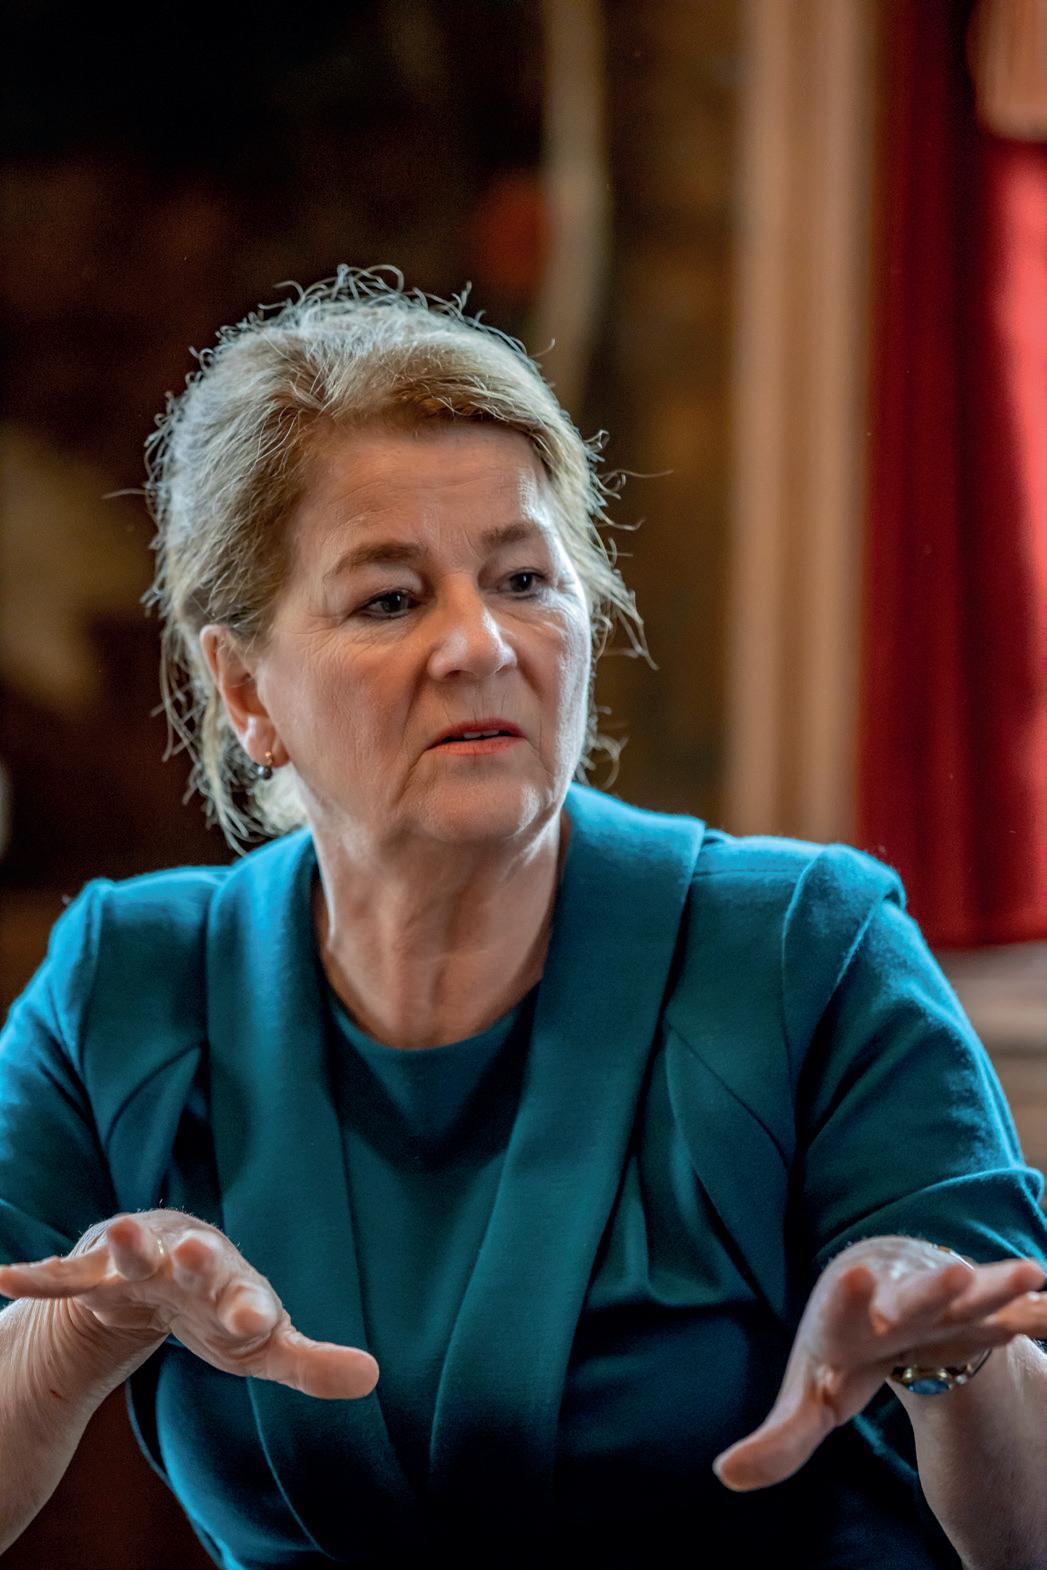 Page 4 of Interview: Burgemeester Annemarie Penn